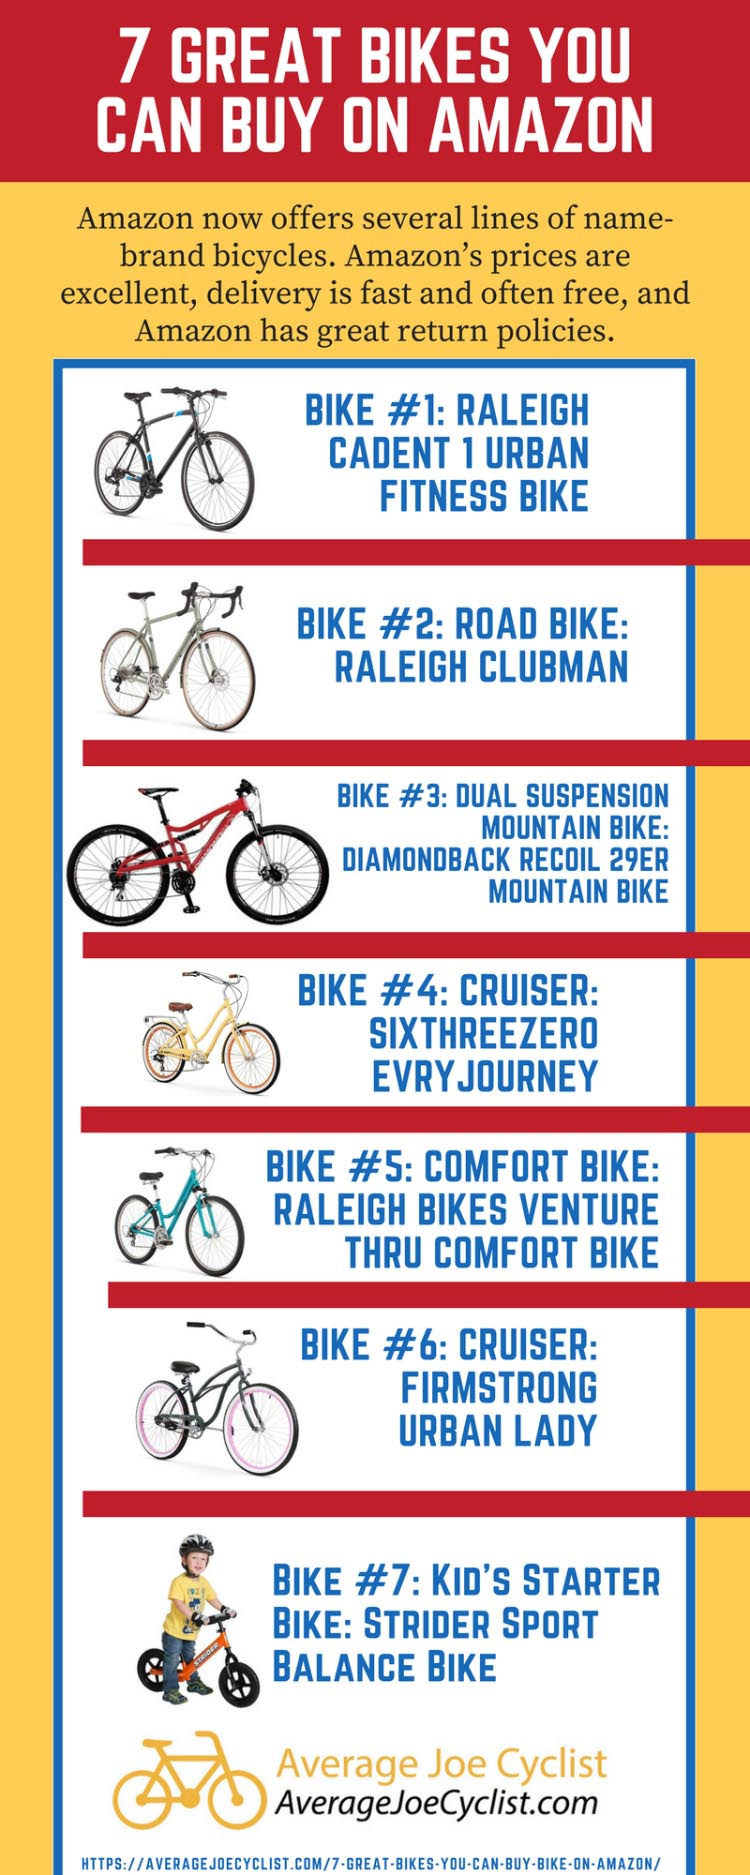 7 great bikes you can buy on Amazon